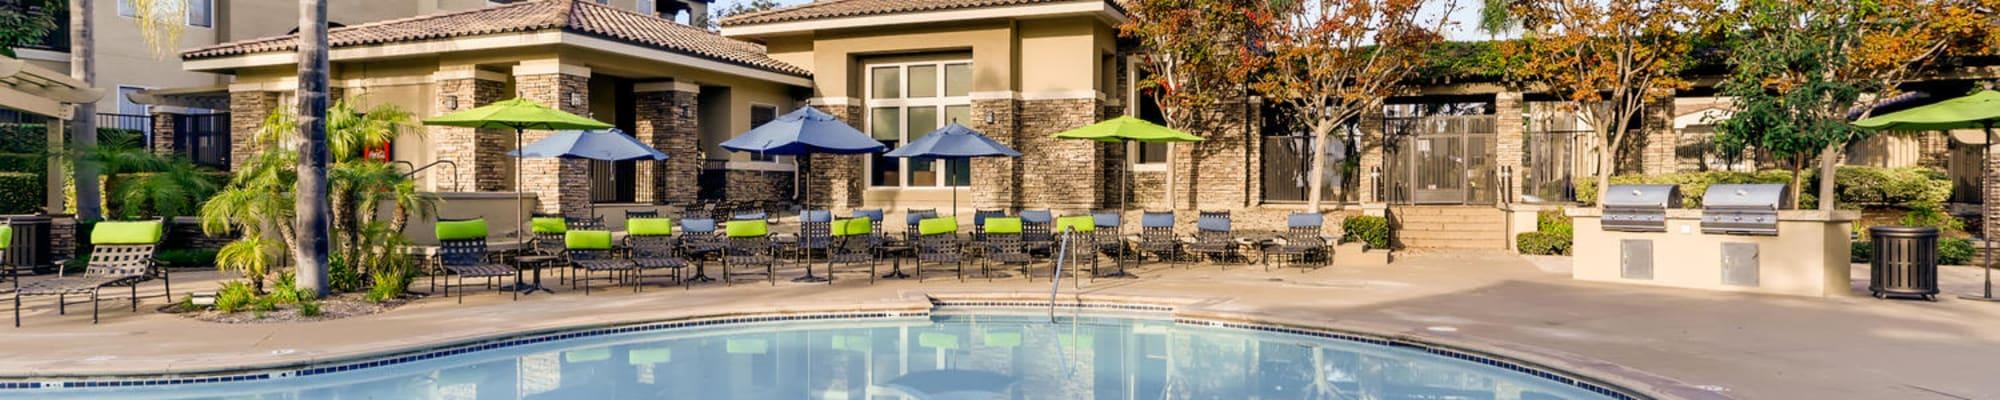 Amenities at Alize at Aliso Viejo Apartment Homes in Aliso Viejo, California